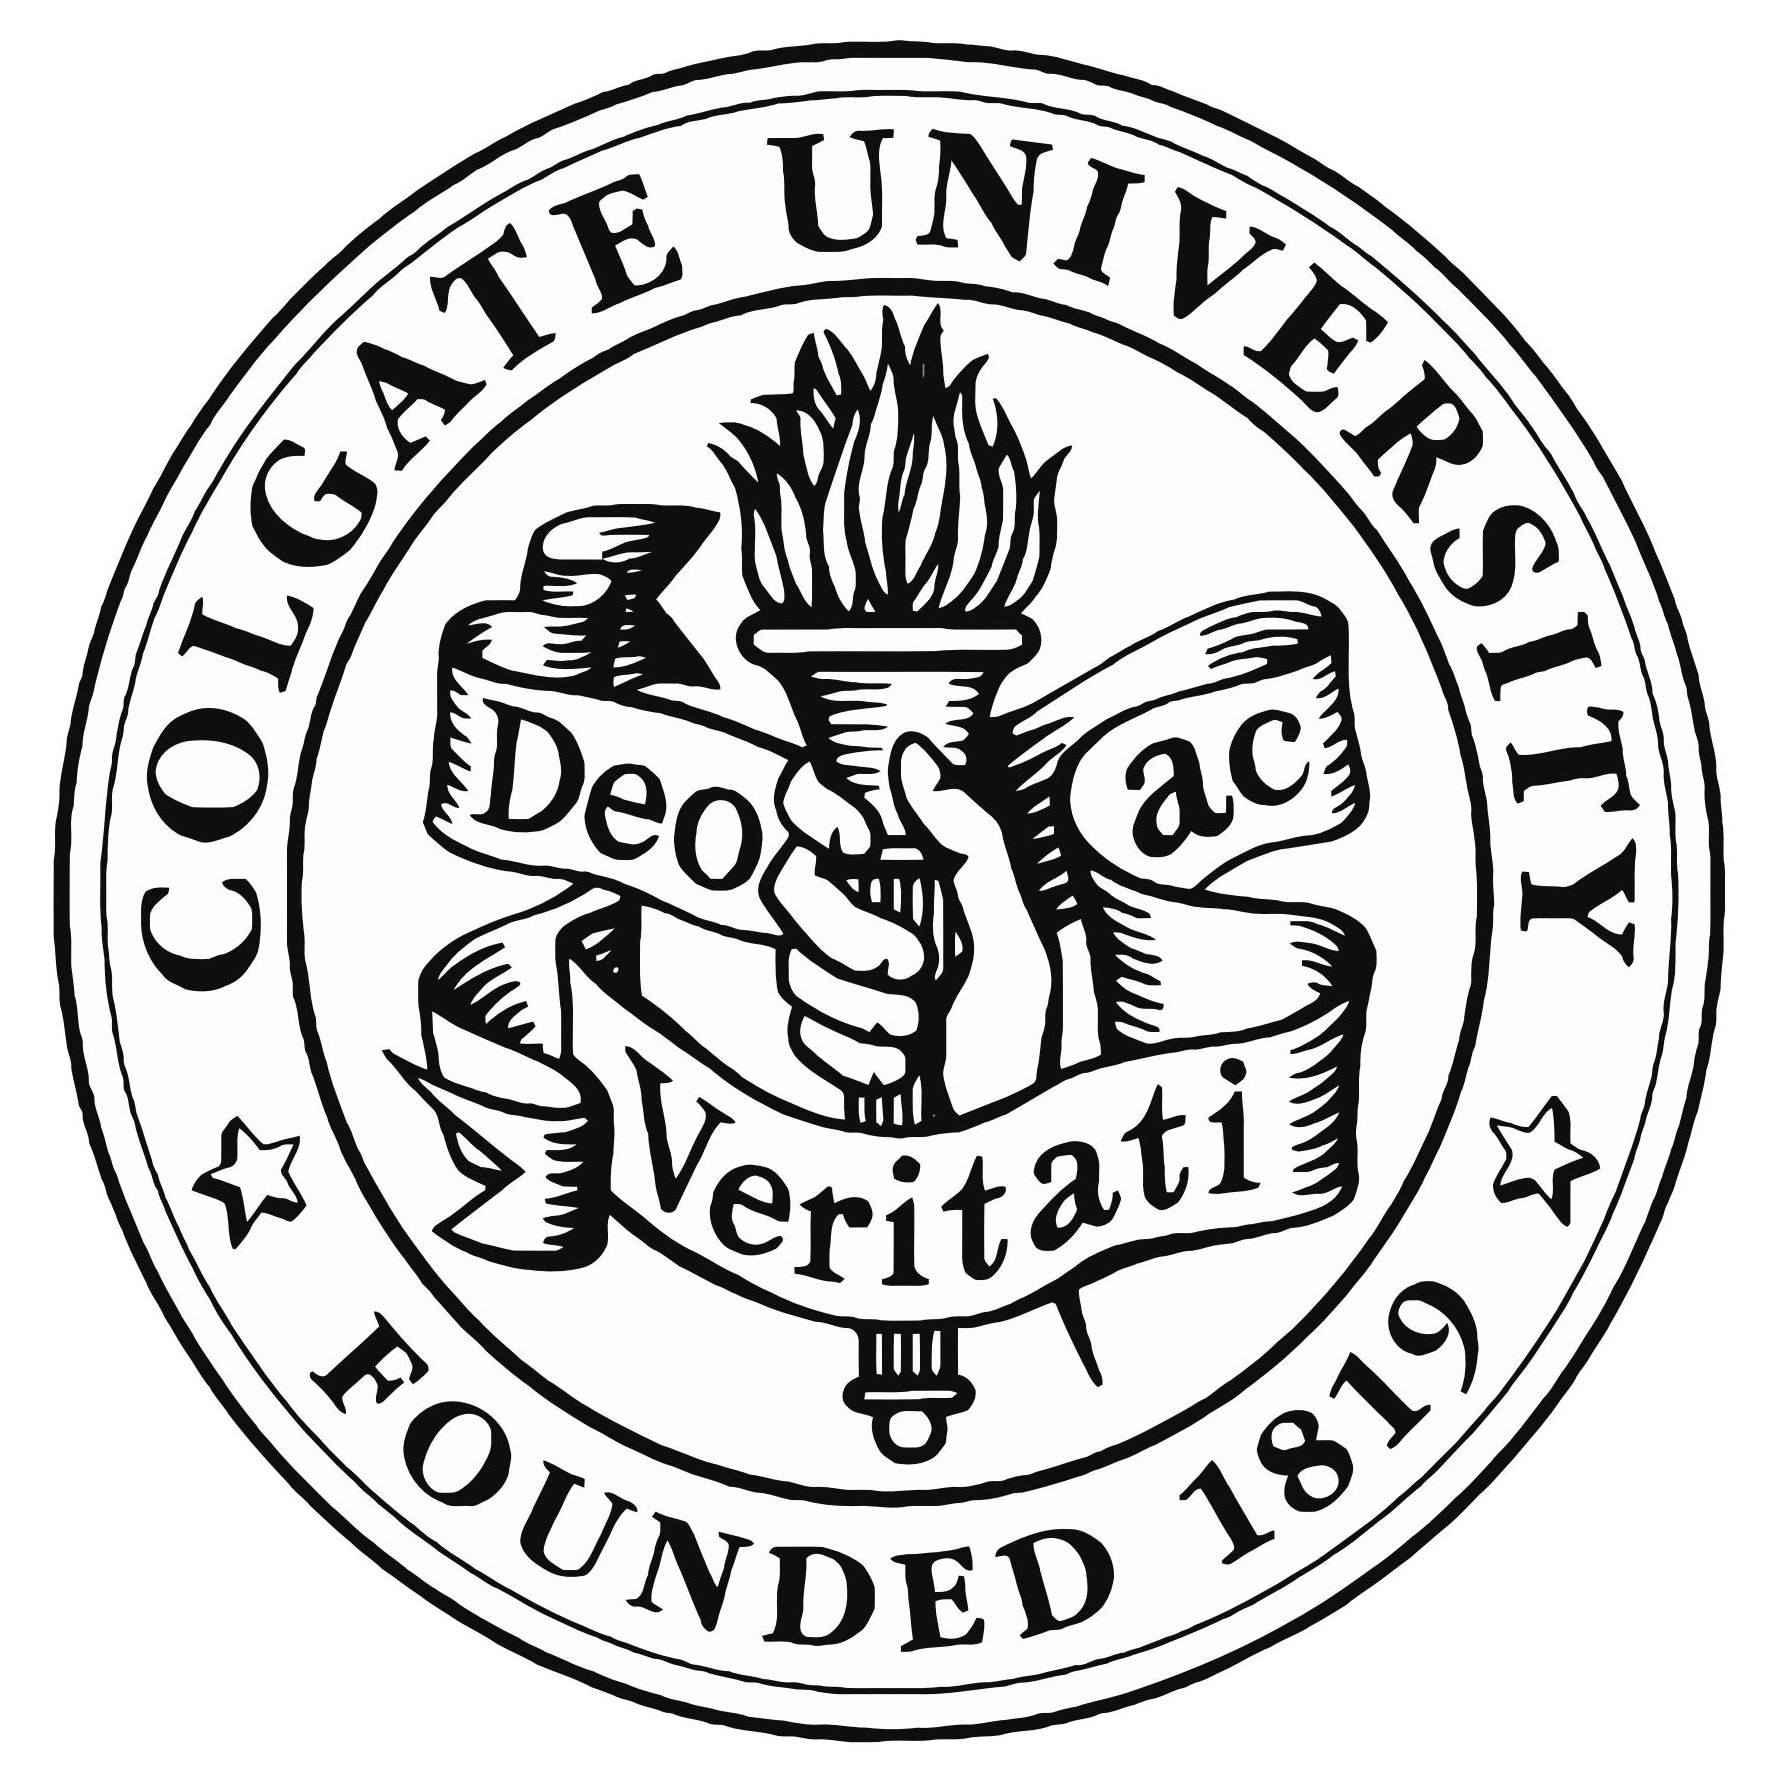 colgate_university_seal